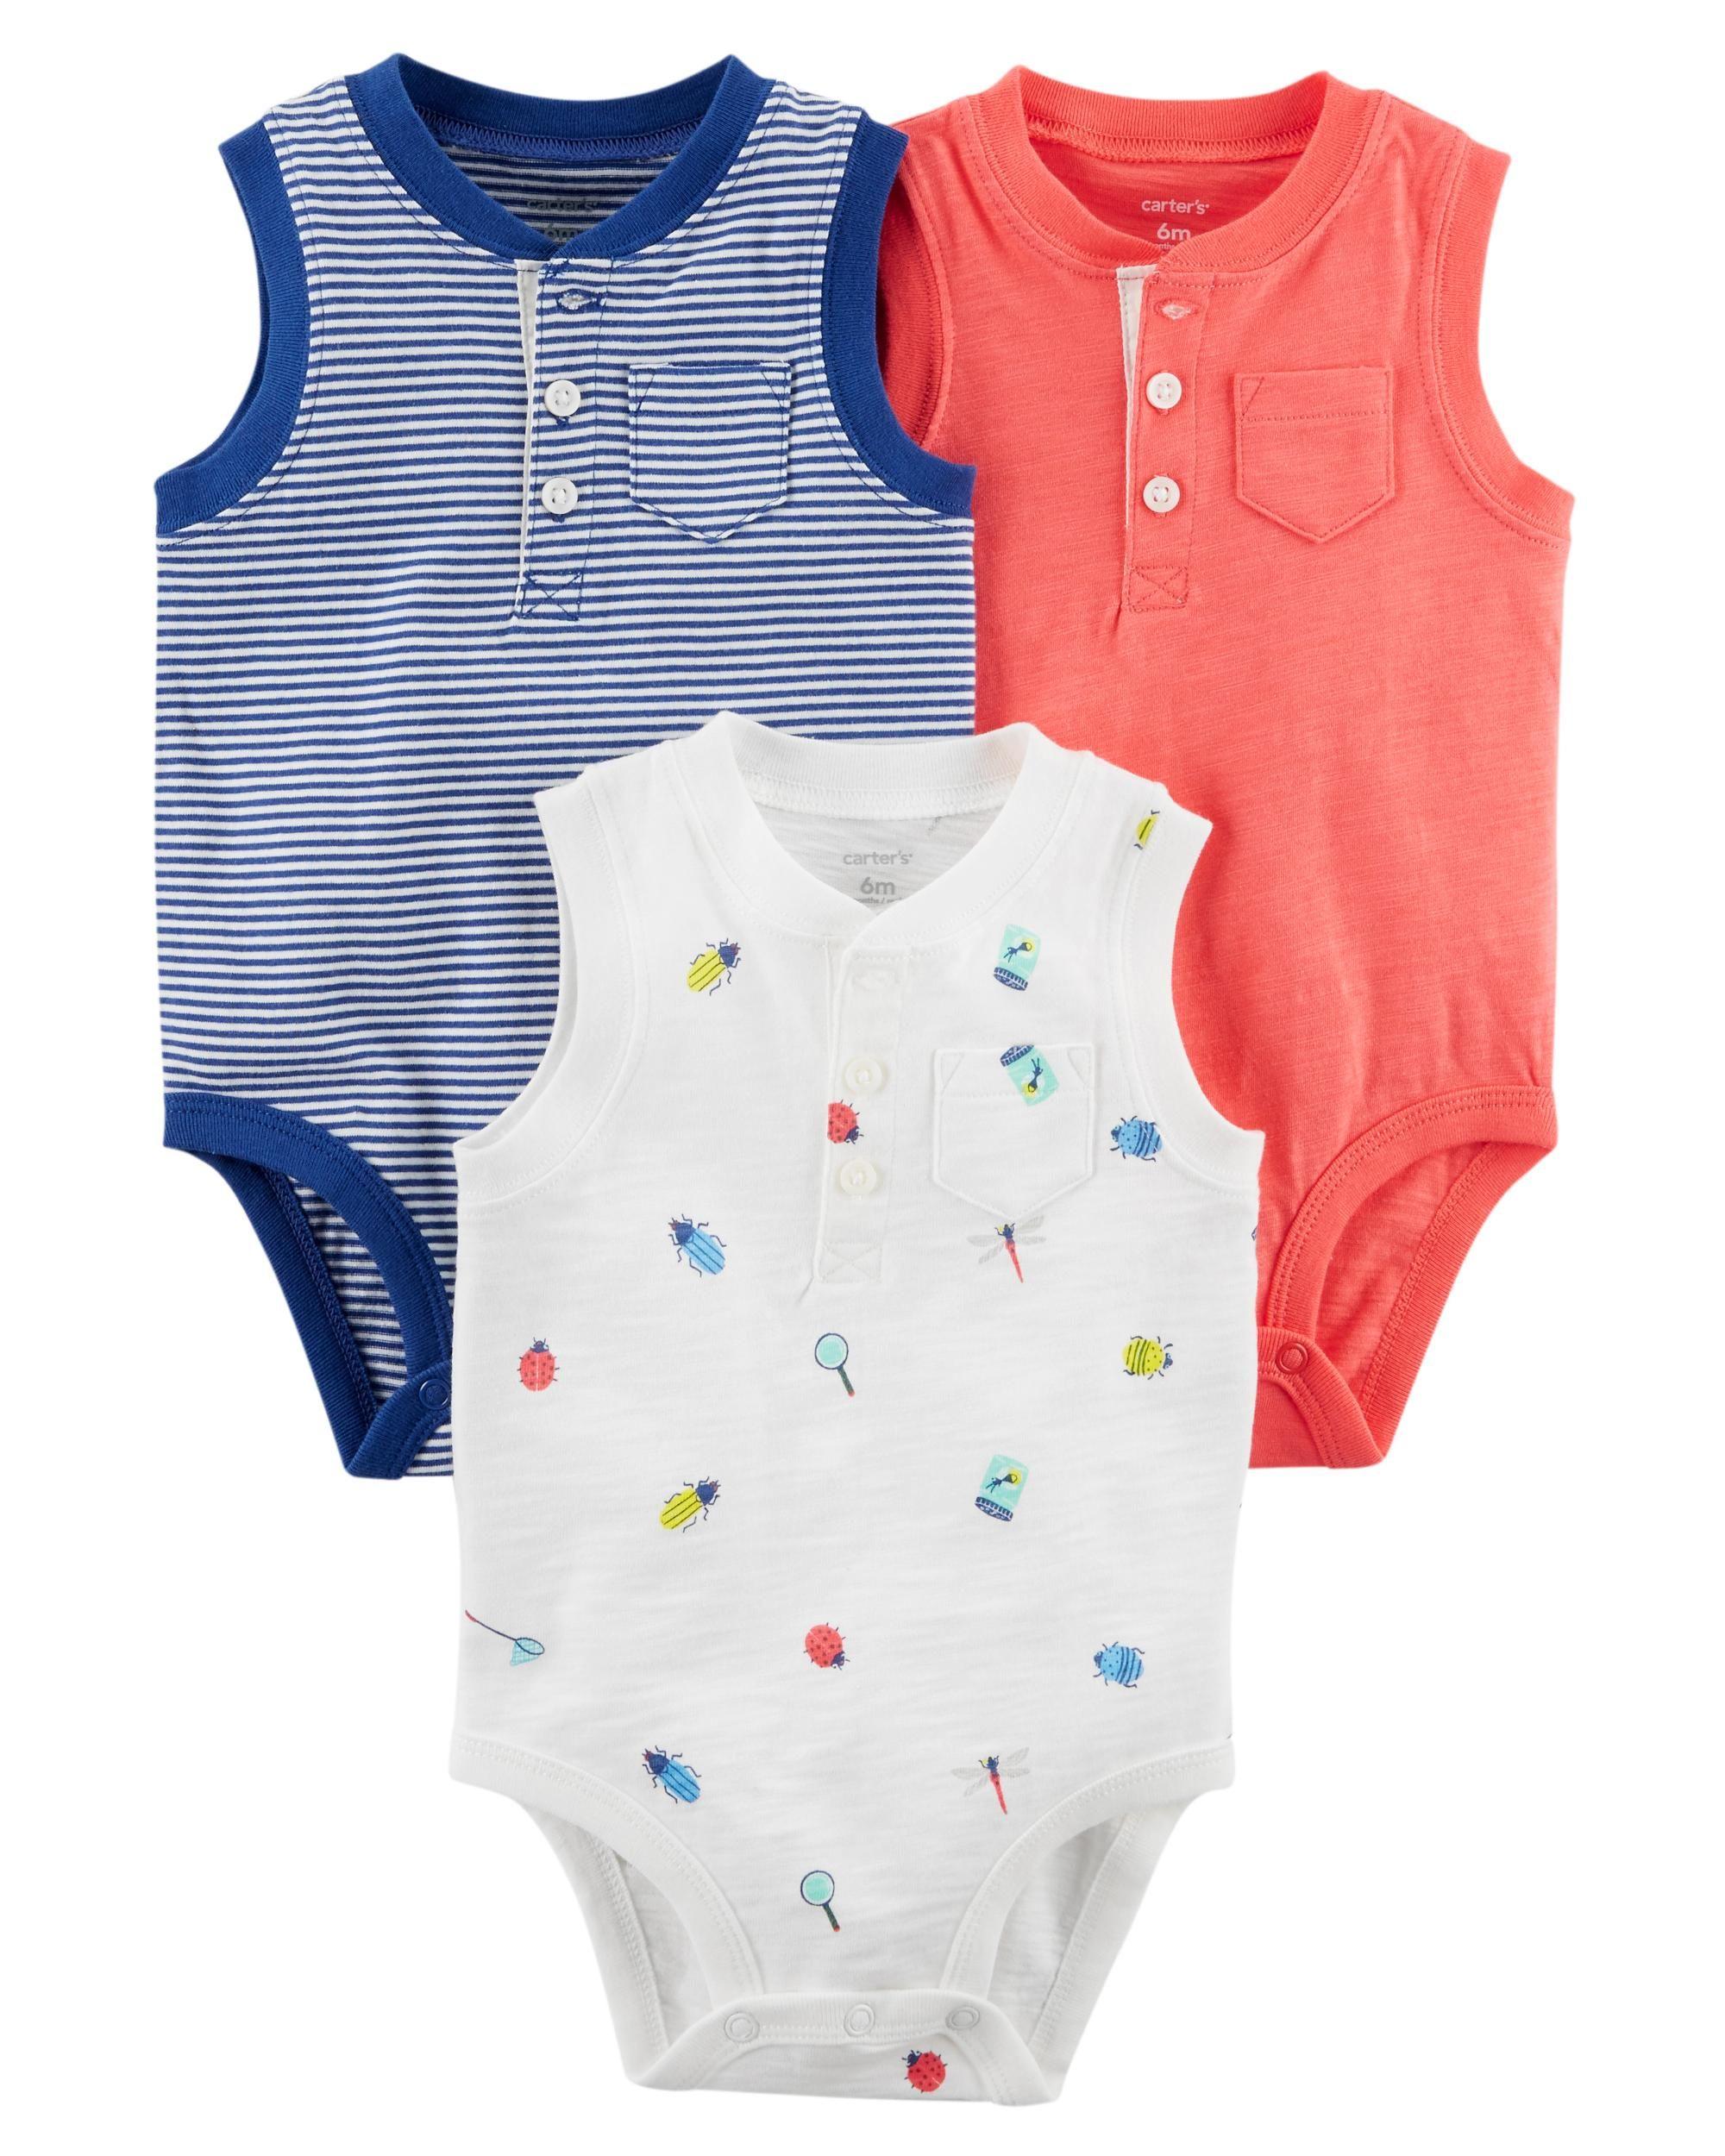 20% Off Baby boy Bodysuits